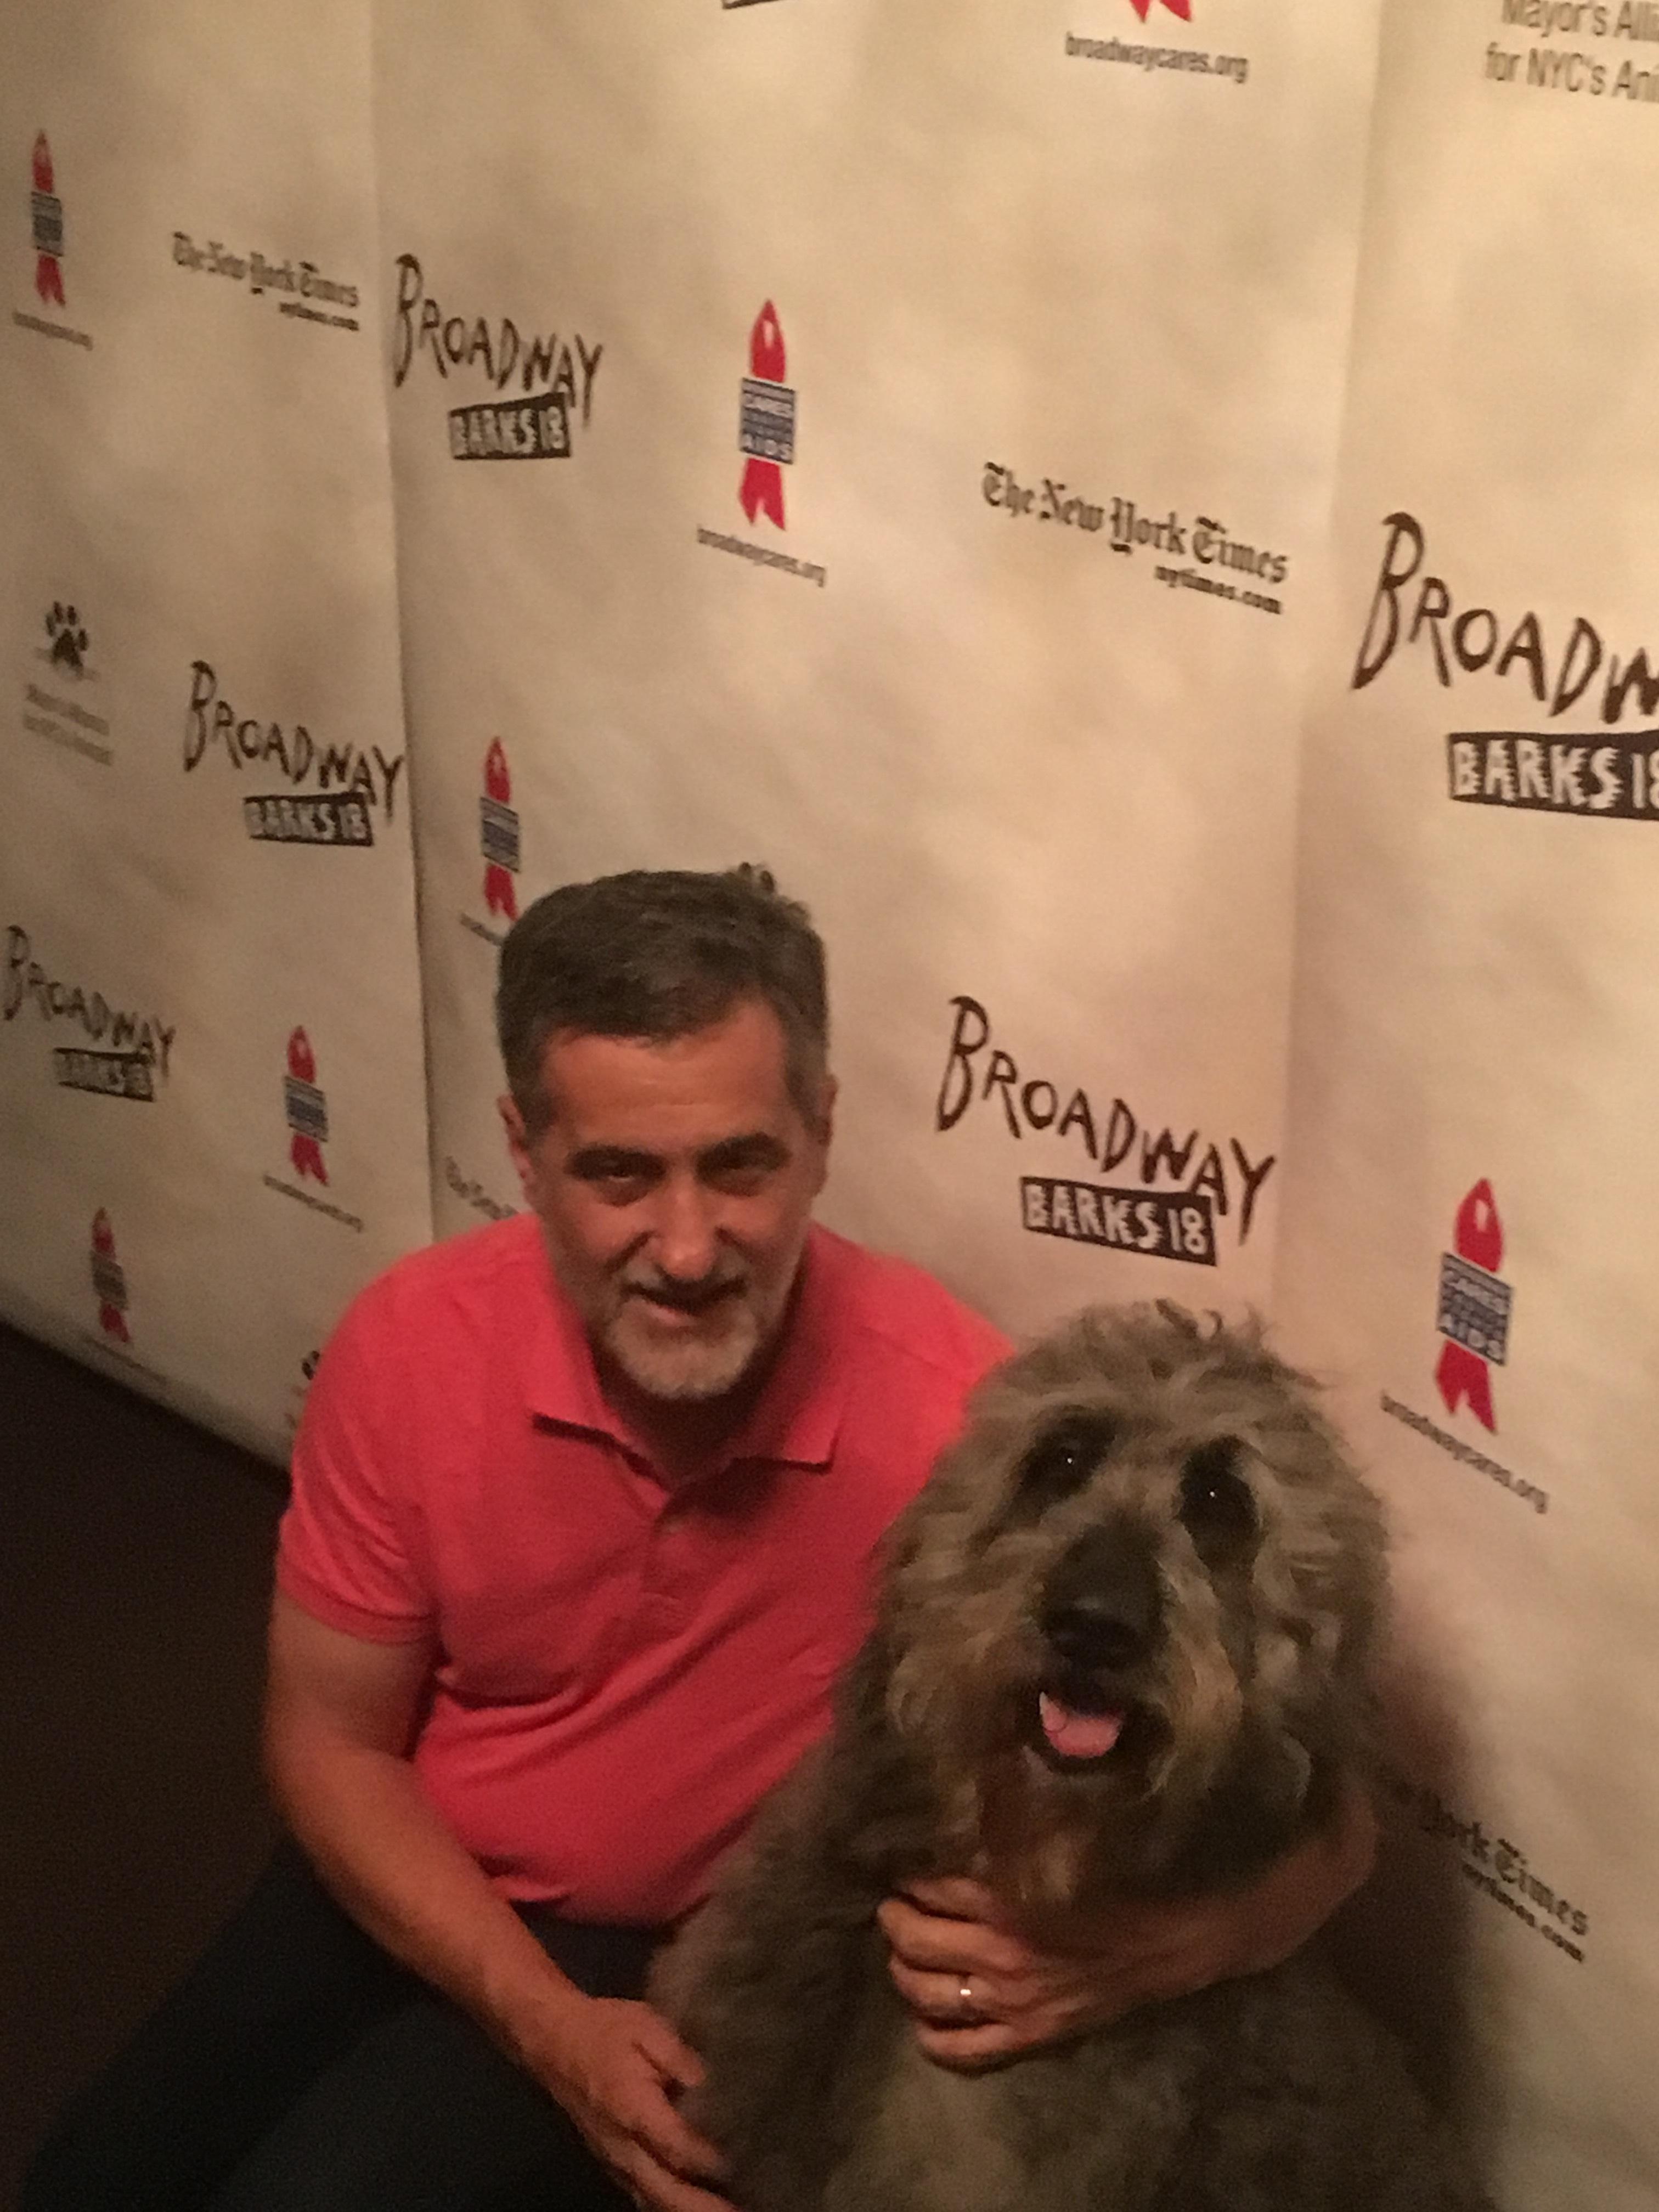 Bill Berloni and dog Bowdie. Photo by Ryan Leeds